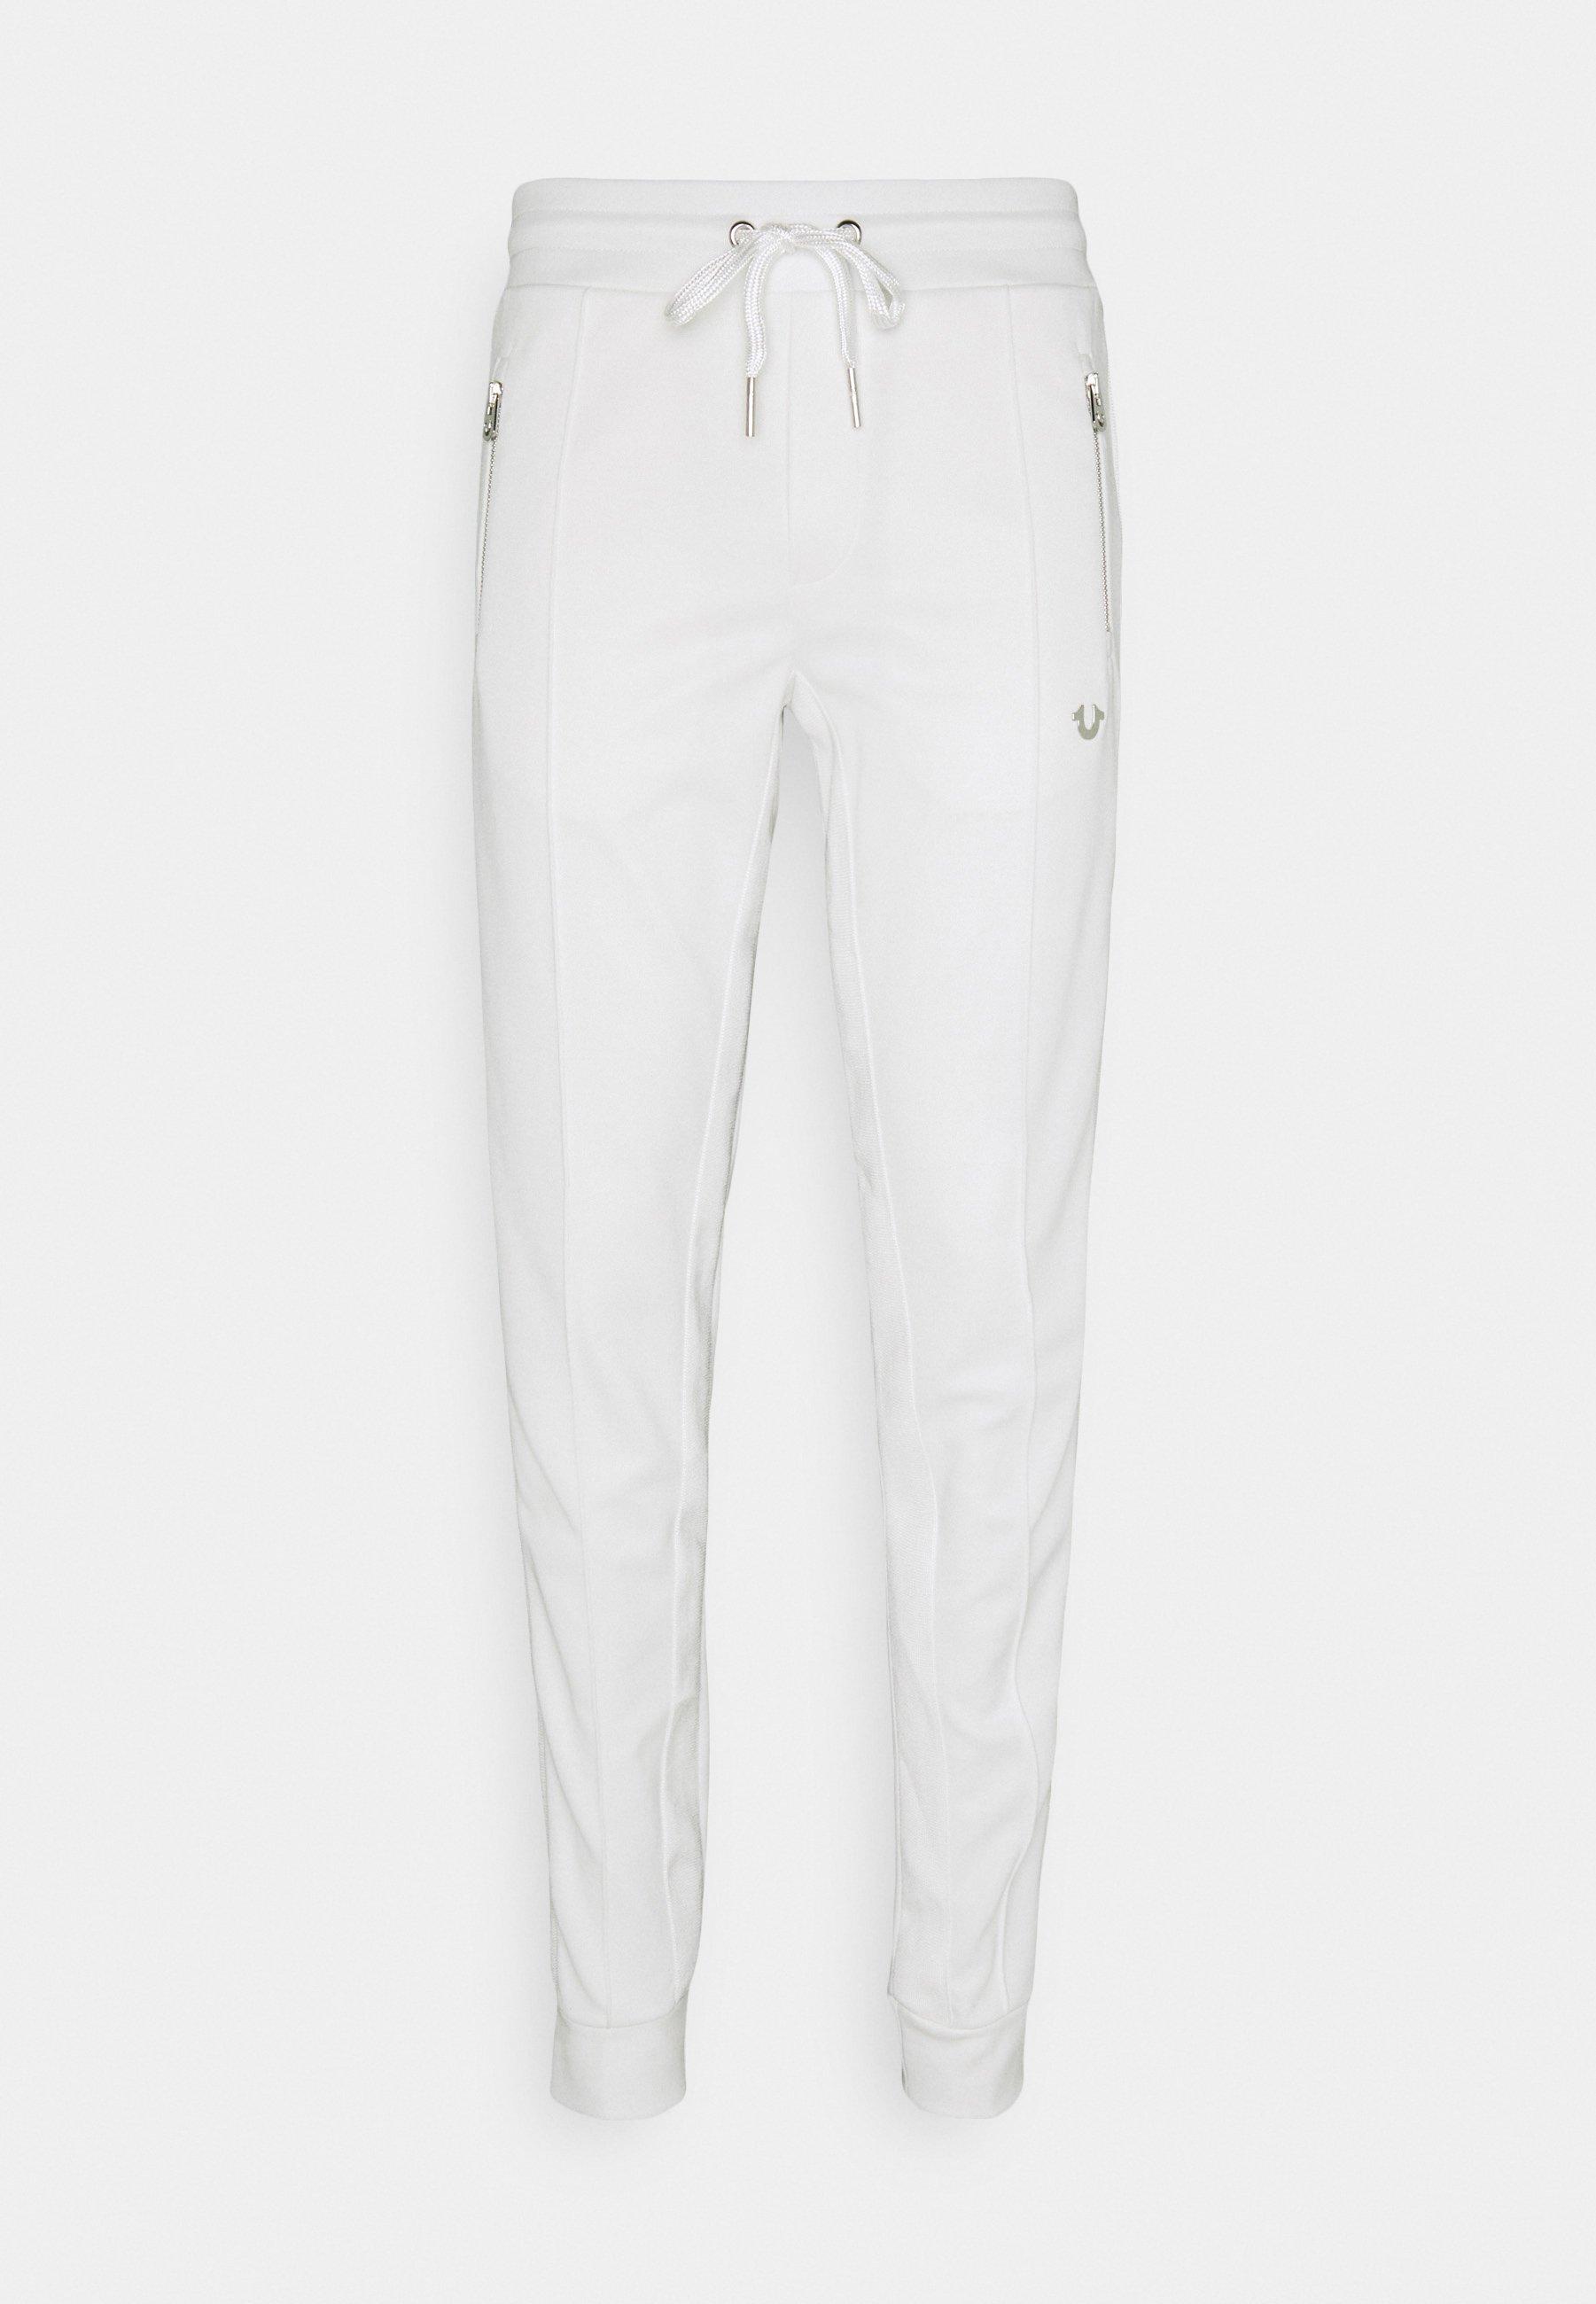 True Religion Pant Pantalones Deportivos White Blanco Zalando Es